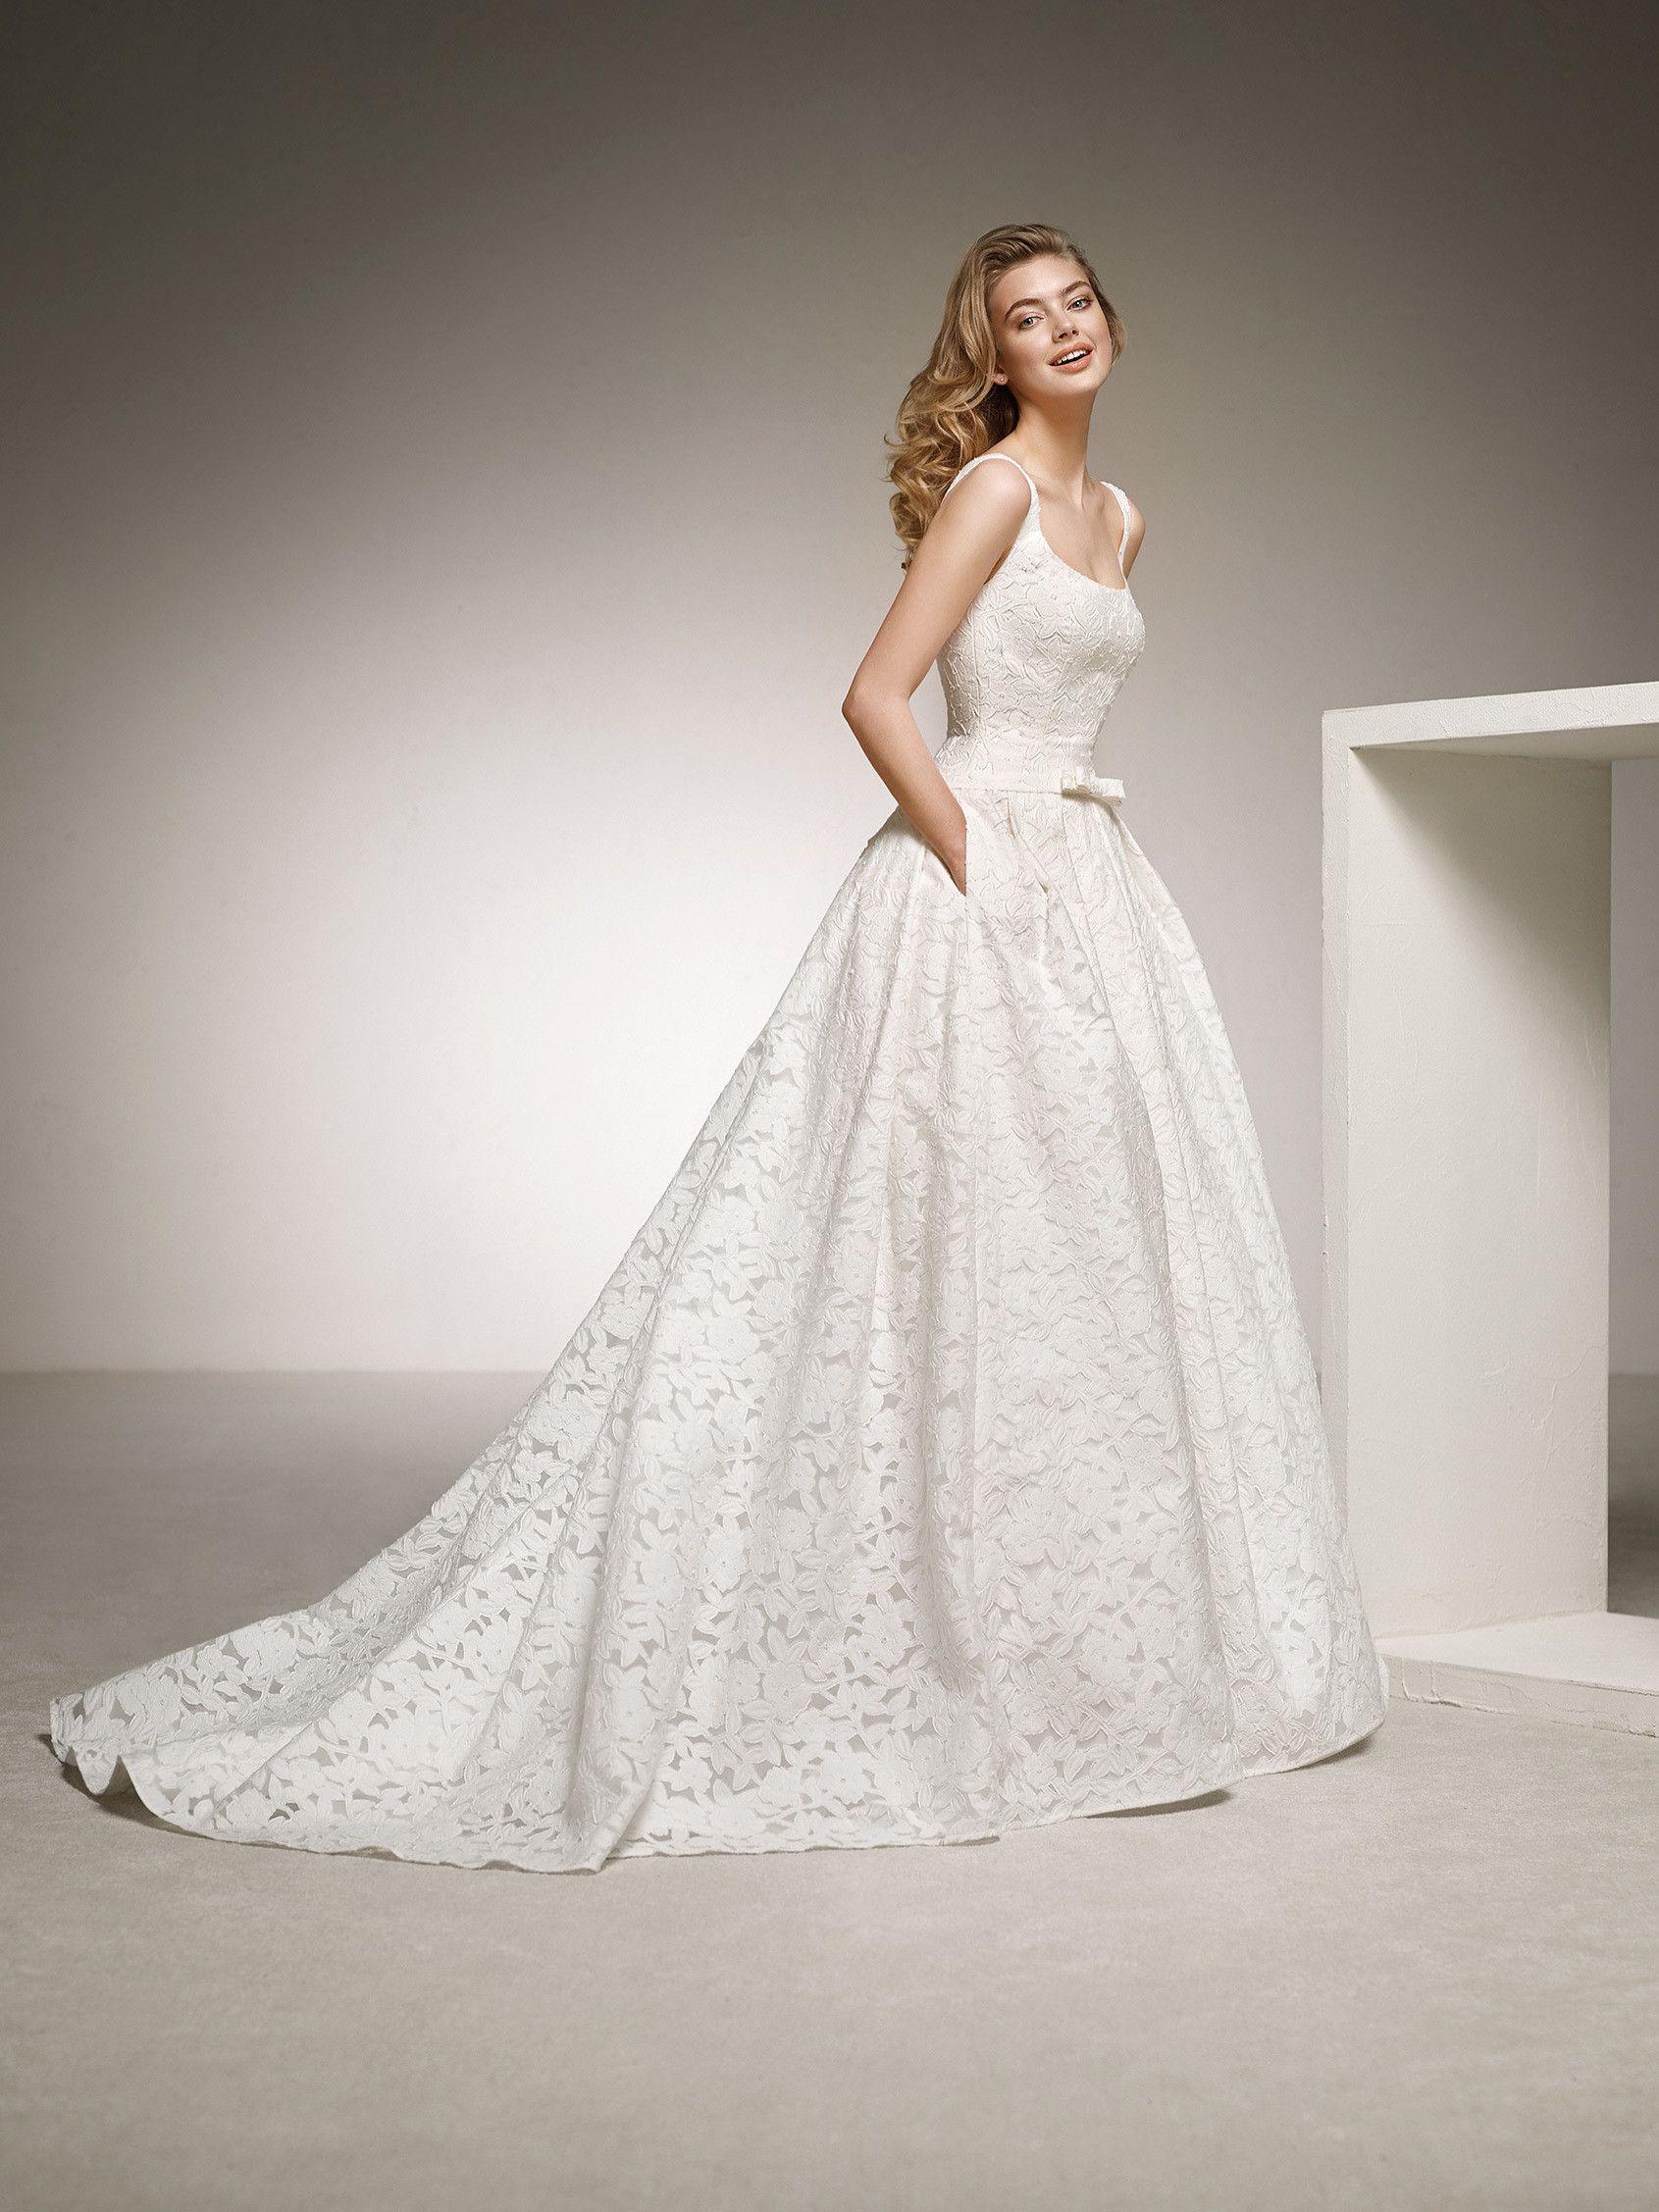 Marvellous wedding dress with ballgown skirt. DEESA   Pronovias 2018 ...